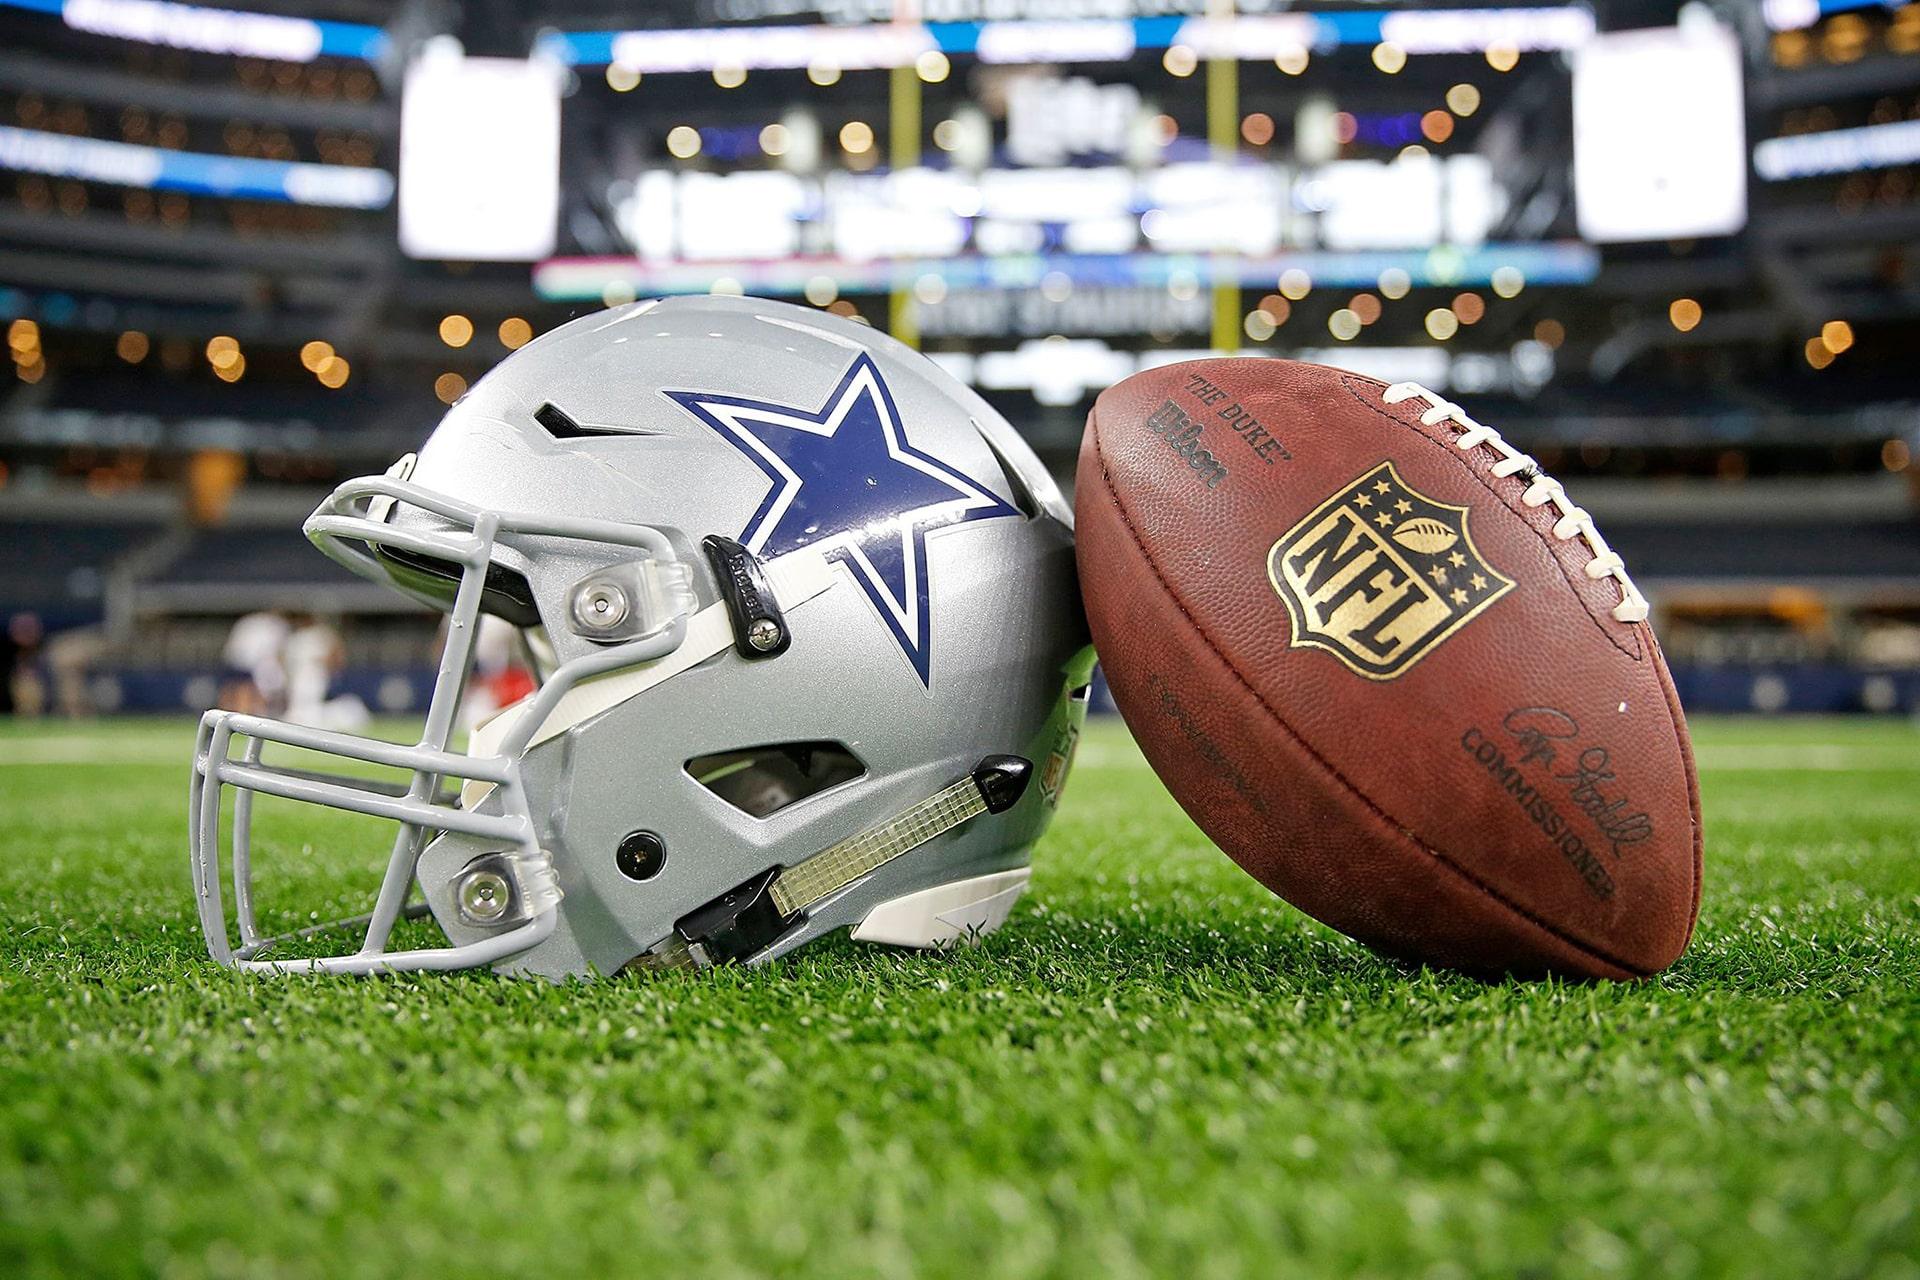 Courtesy of Dallas Cowboys Facebook